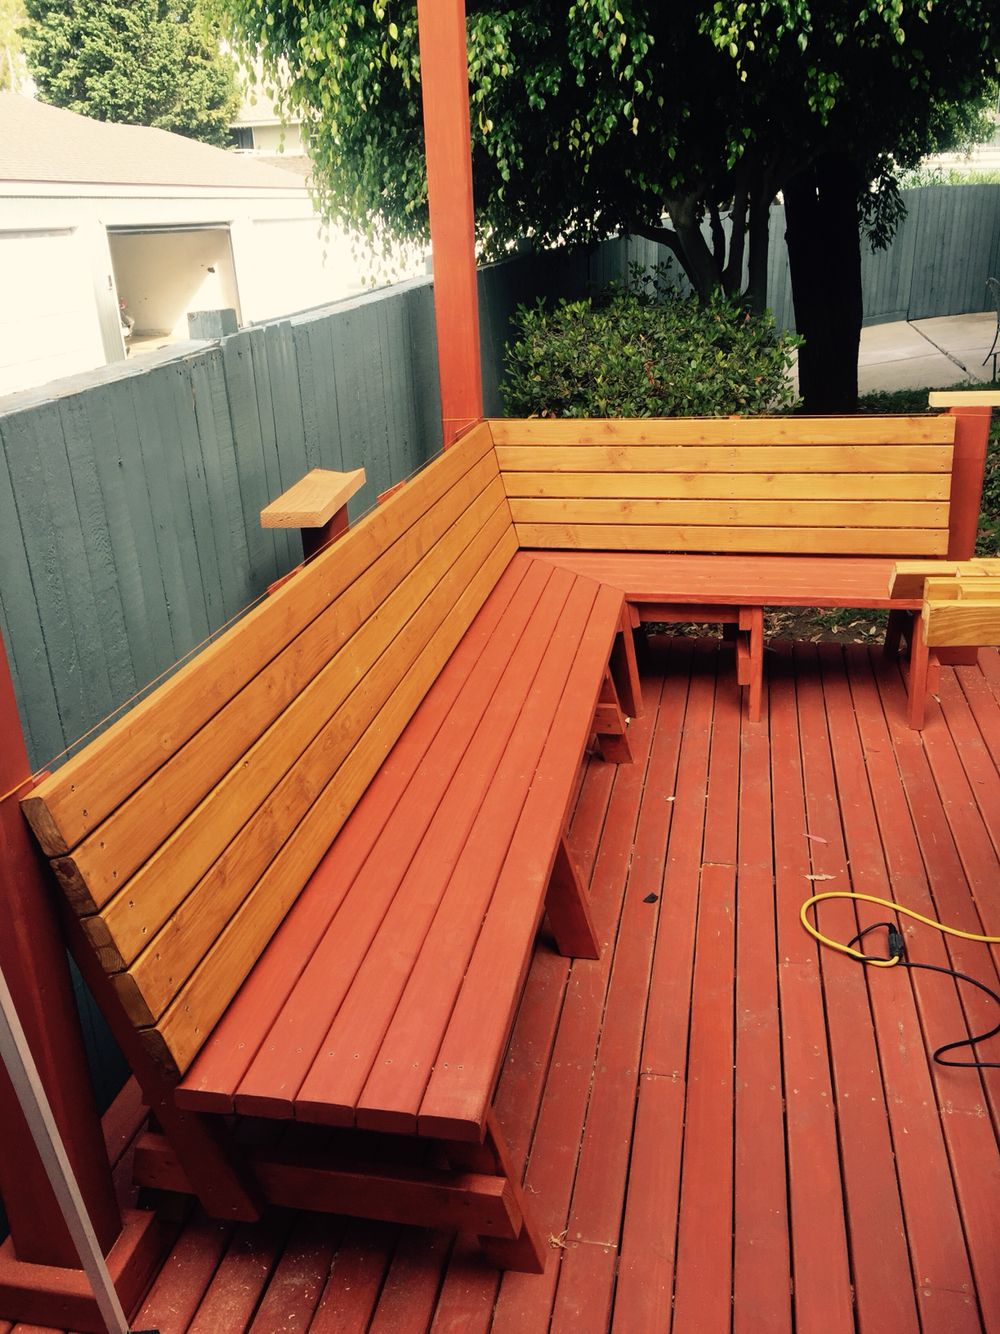 Deck Benches Deck Seating Deck Bench Outdoor Deck Lighting